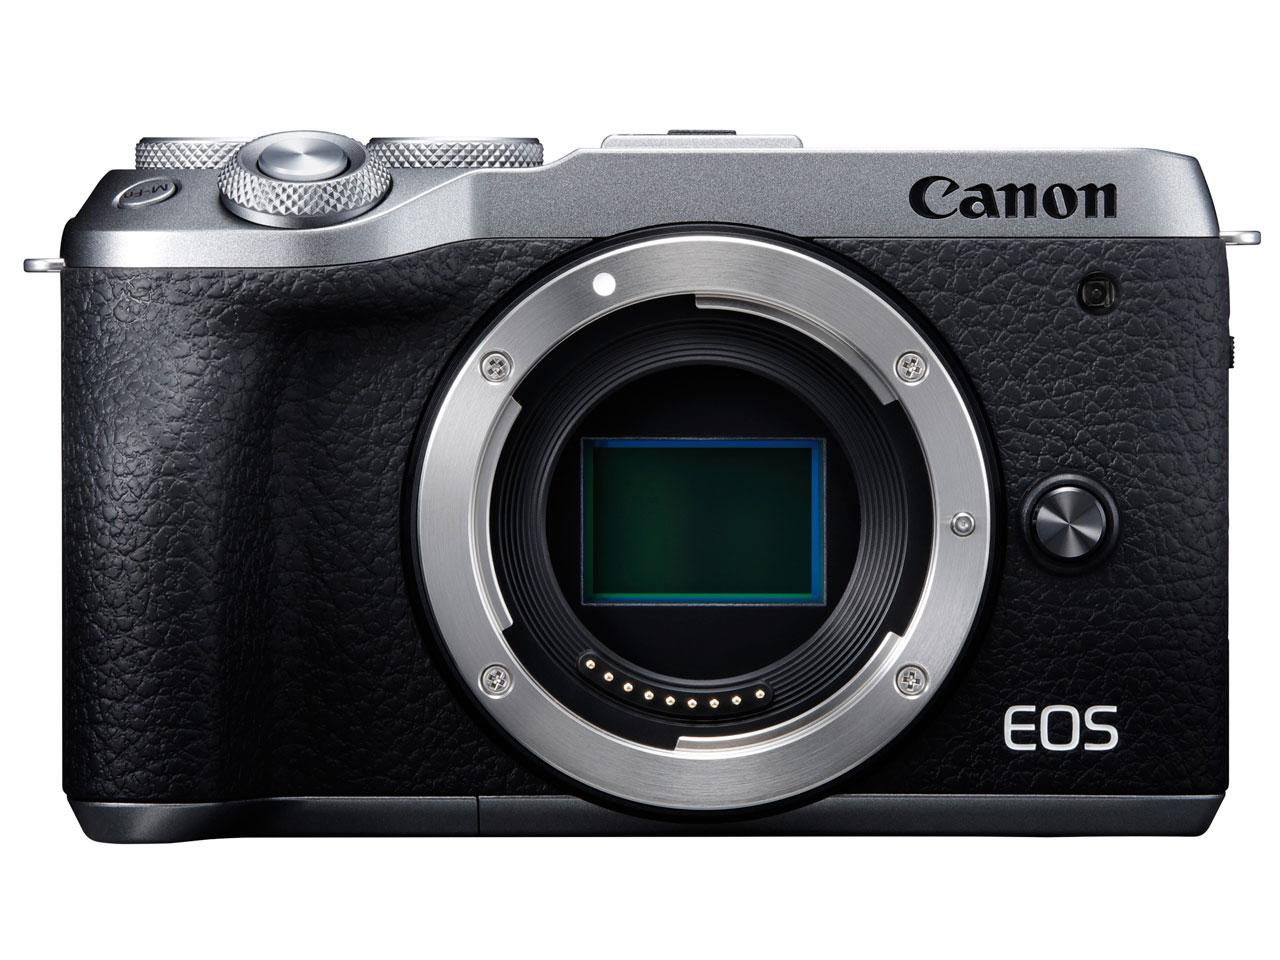 Canon EOS M6 Mark II ボディ [シルバー]【お取り寄せ(メーカー取り寄せ/予約受付中)】※1~2ヶ月